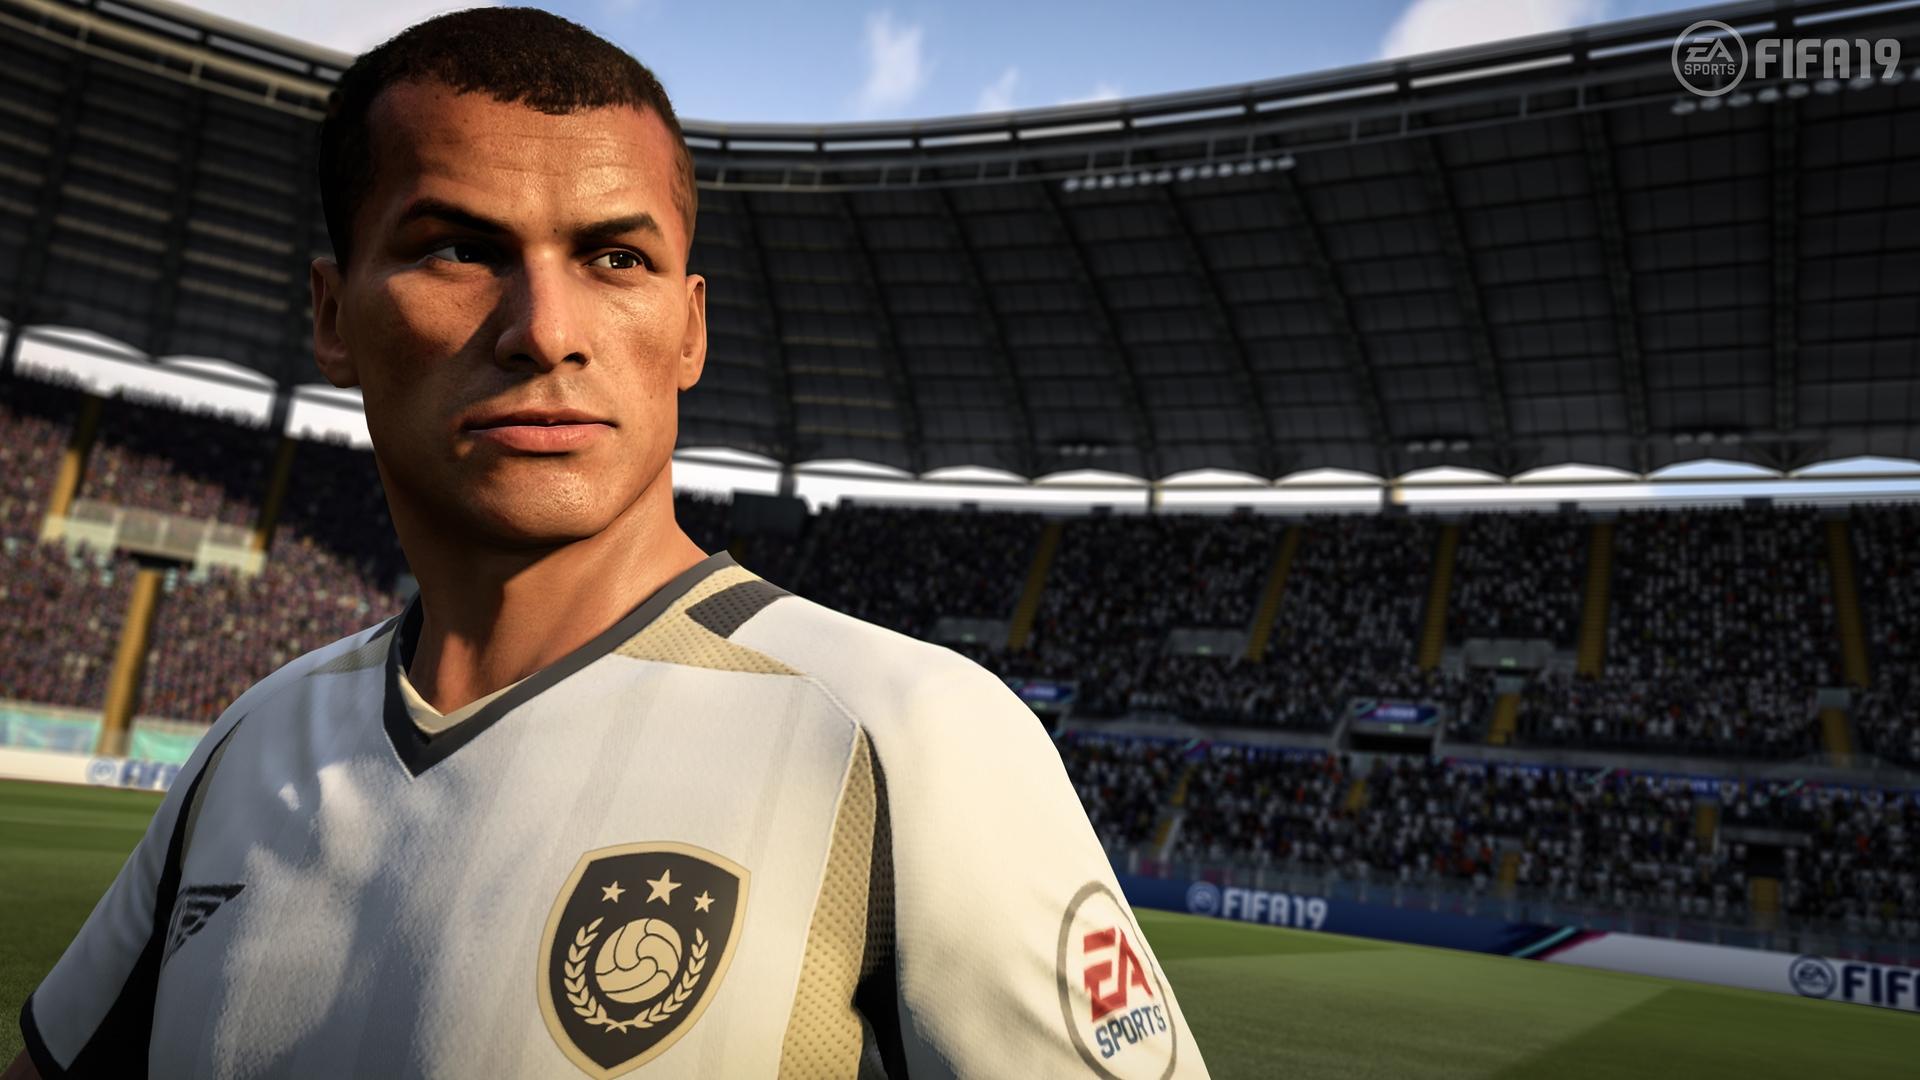 《FIFA 19》干流球员点评